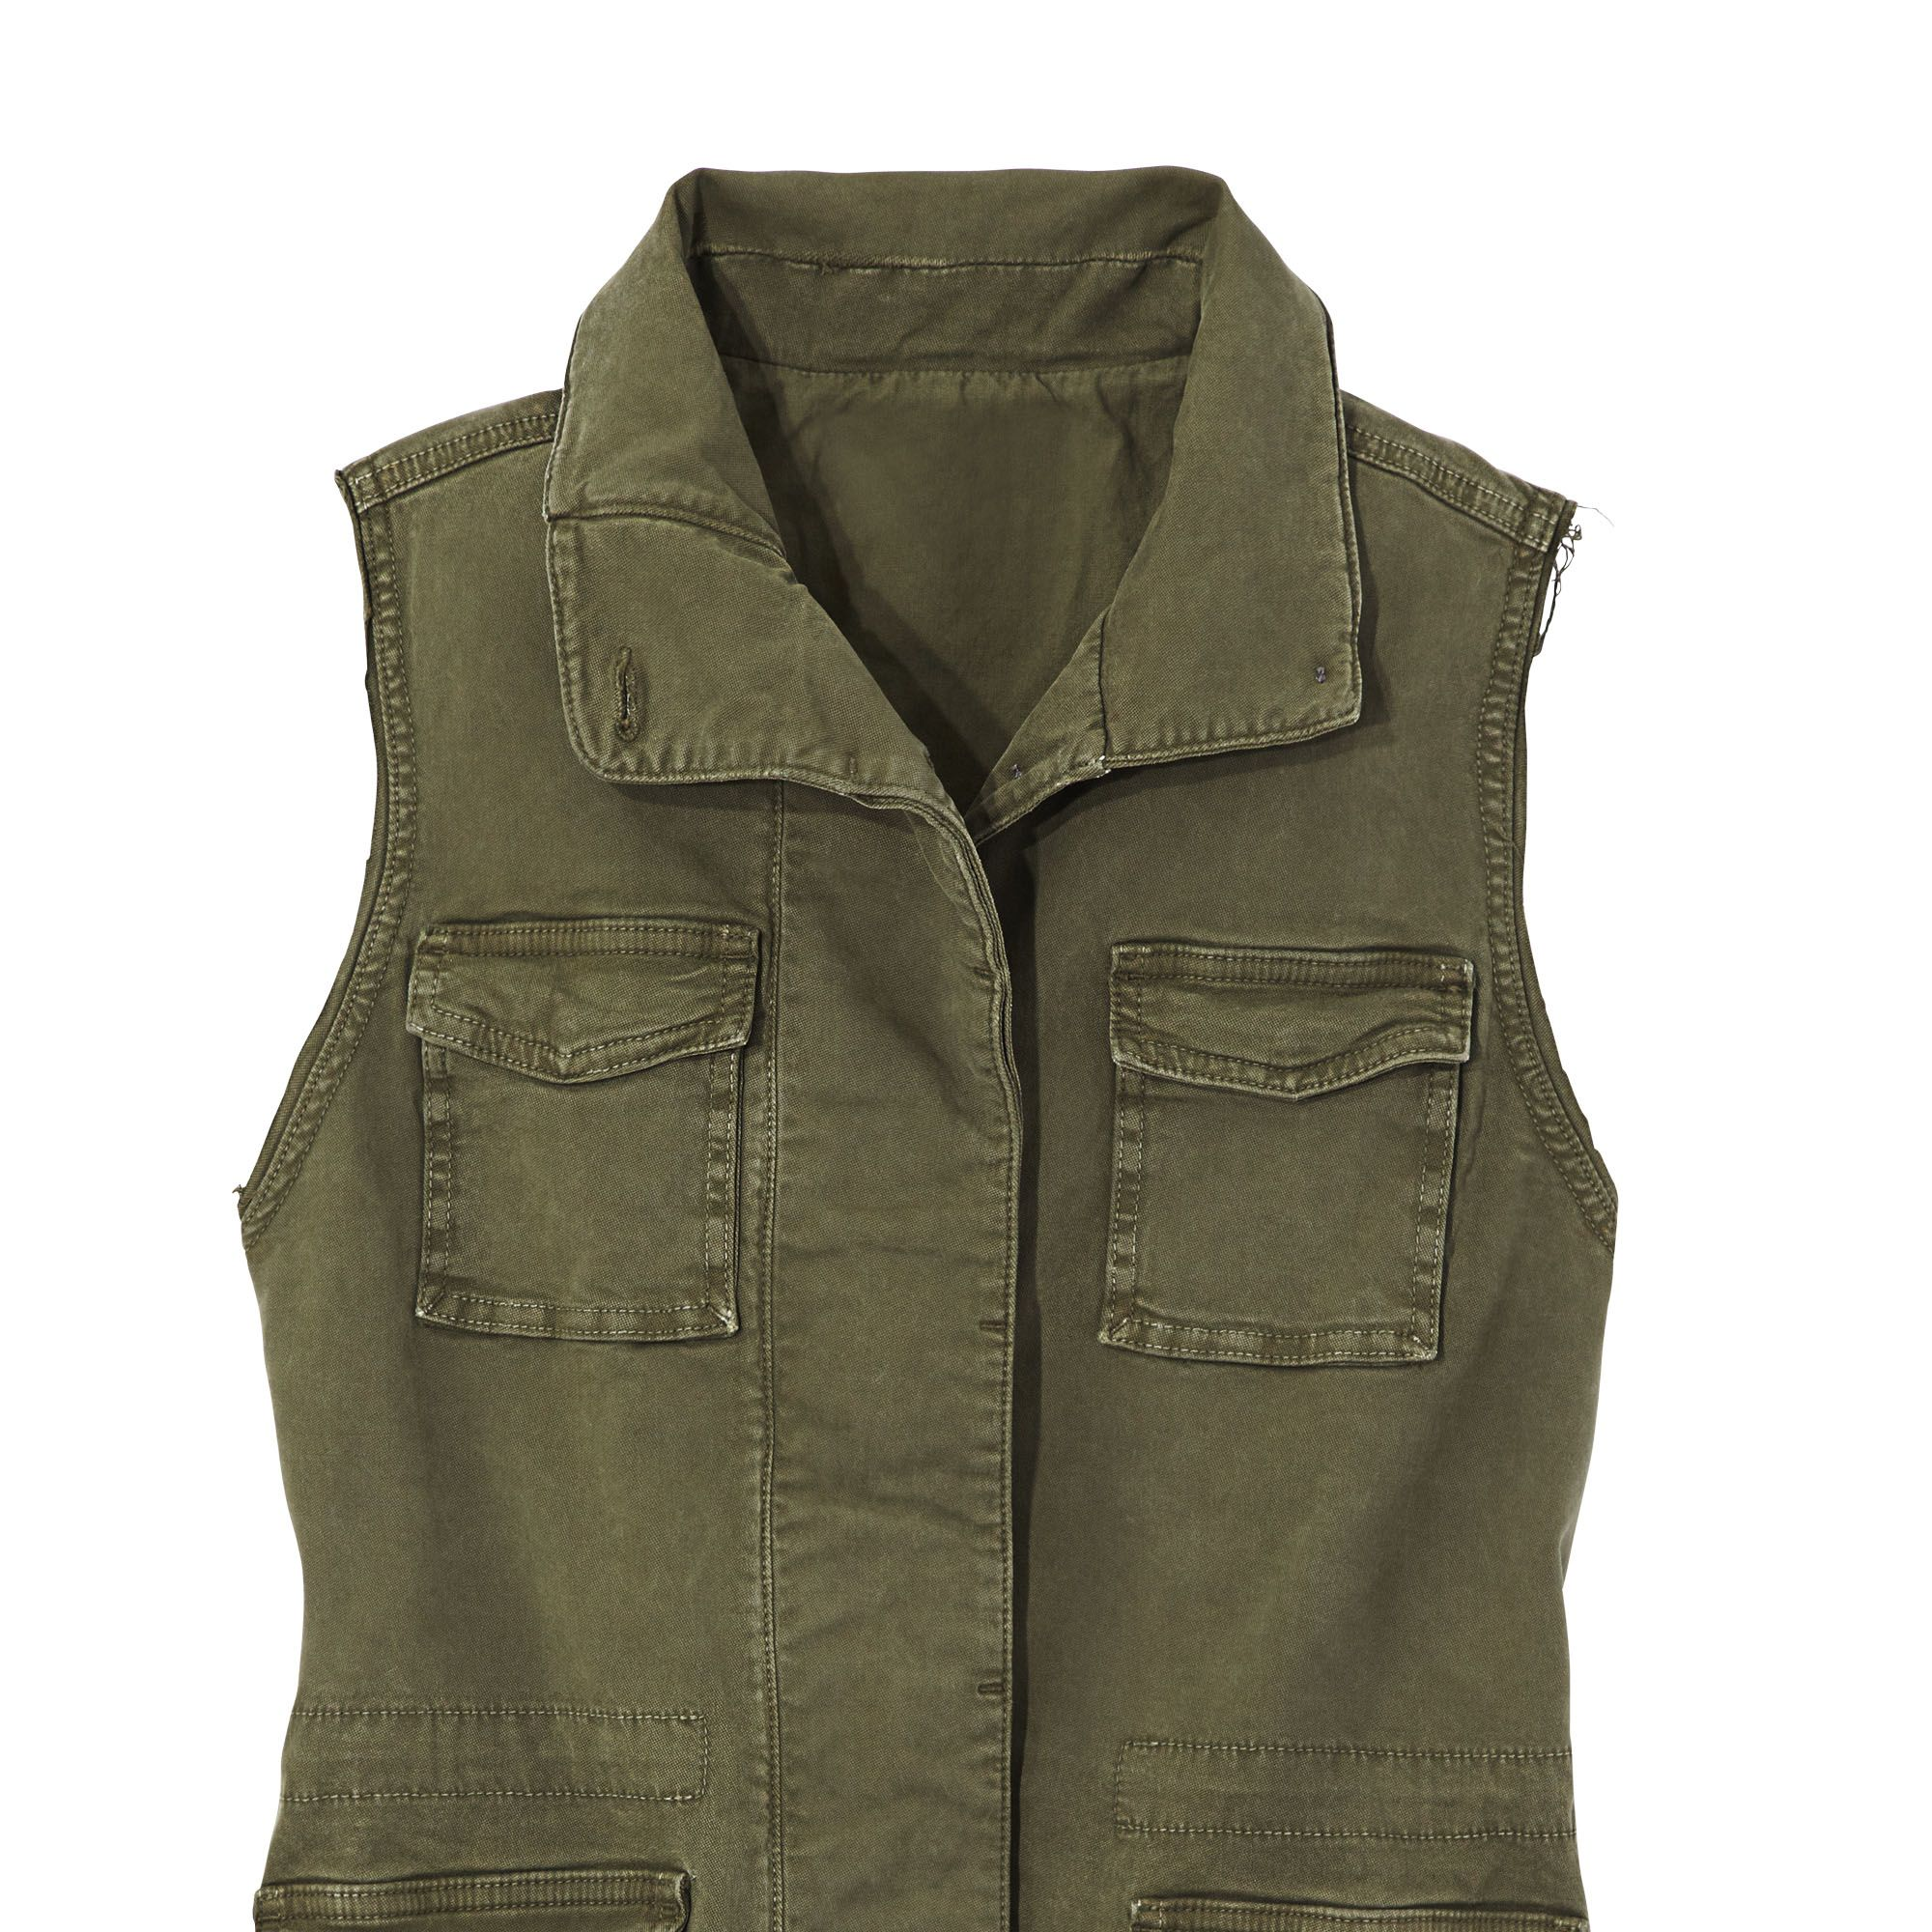 "<strong>J Brand </strong>vest, $248, <a target=""_blank"" href=""http://shop.harpersbazaar.com/designers/j-brand/arden-vest/"">shopBAZAAR.com</a> <img src=""http://assets.hdmtools.com/images/HBZ/Shop.svg"" class=""icon shop"">."